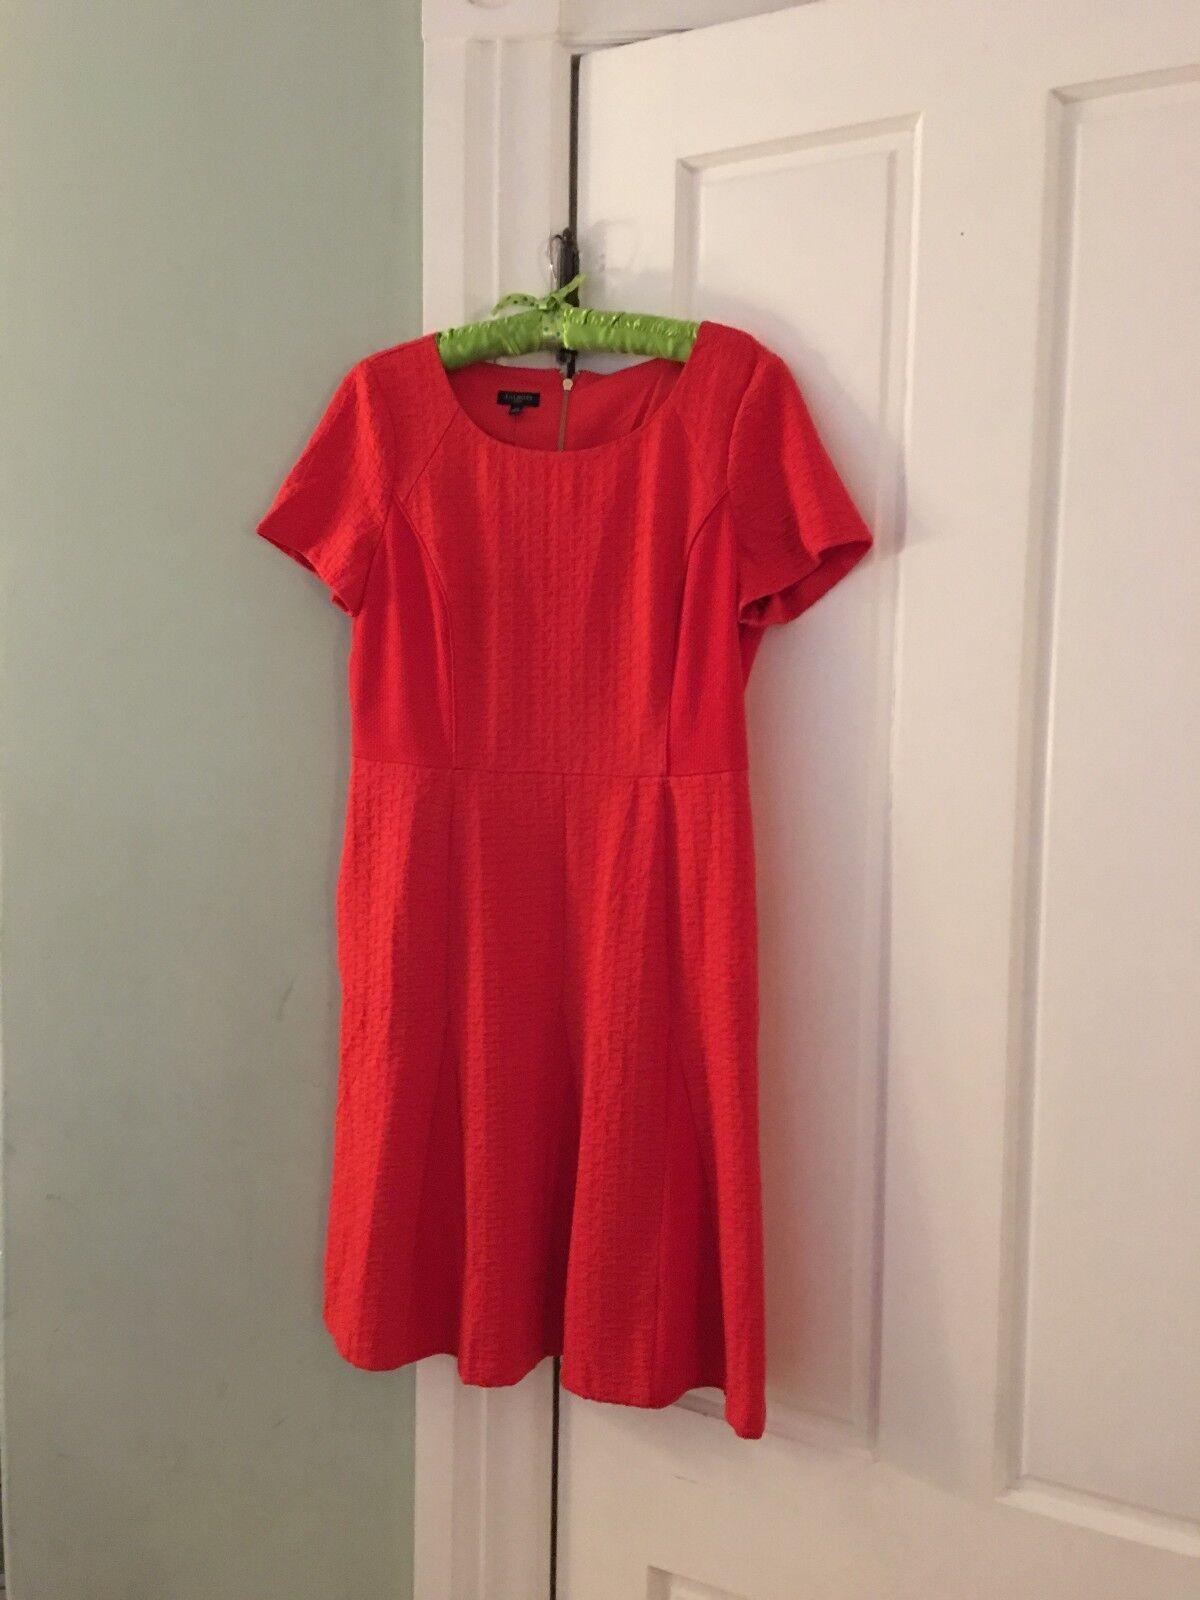 TALBOTS WOMENS DRESS NWT   SIZE 12P  HOLIDAY PERFECT